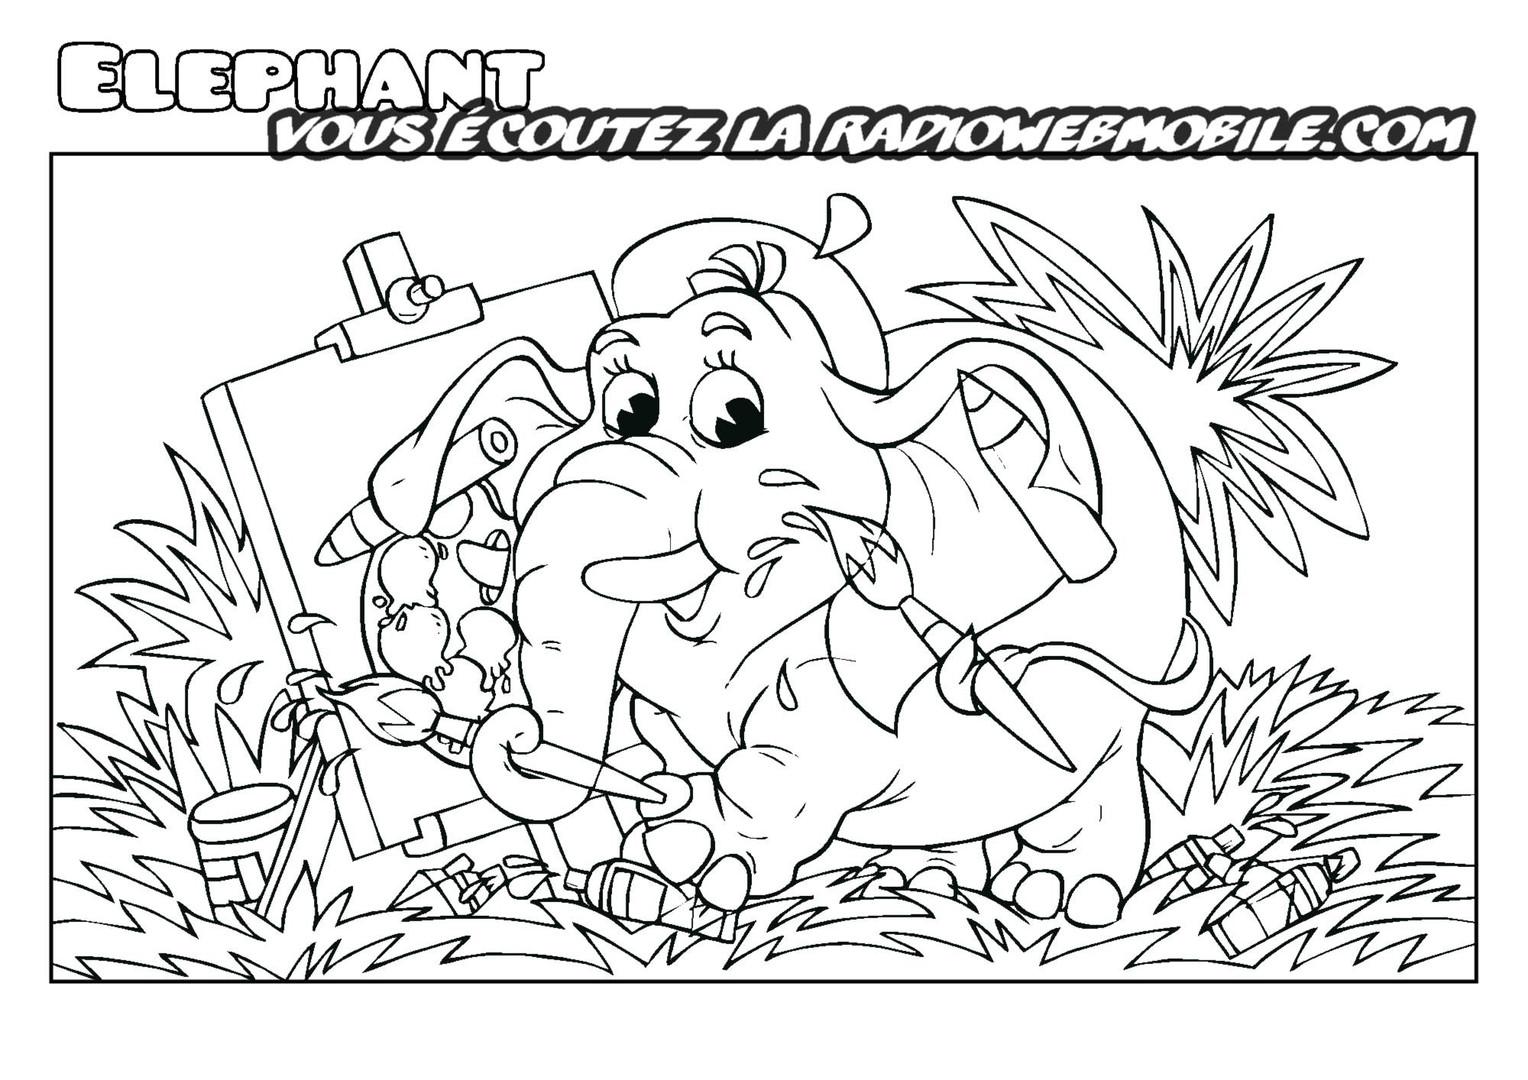 Elephant pour enfant radioweb.jpg